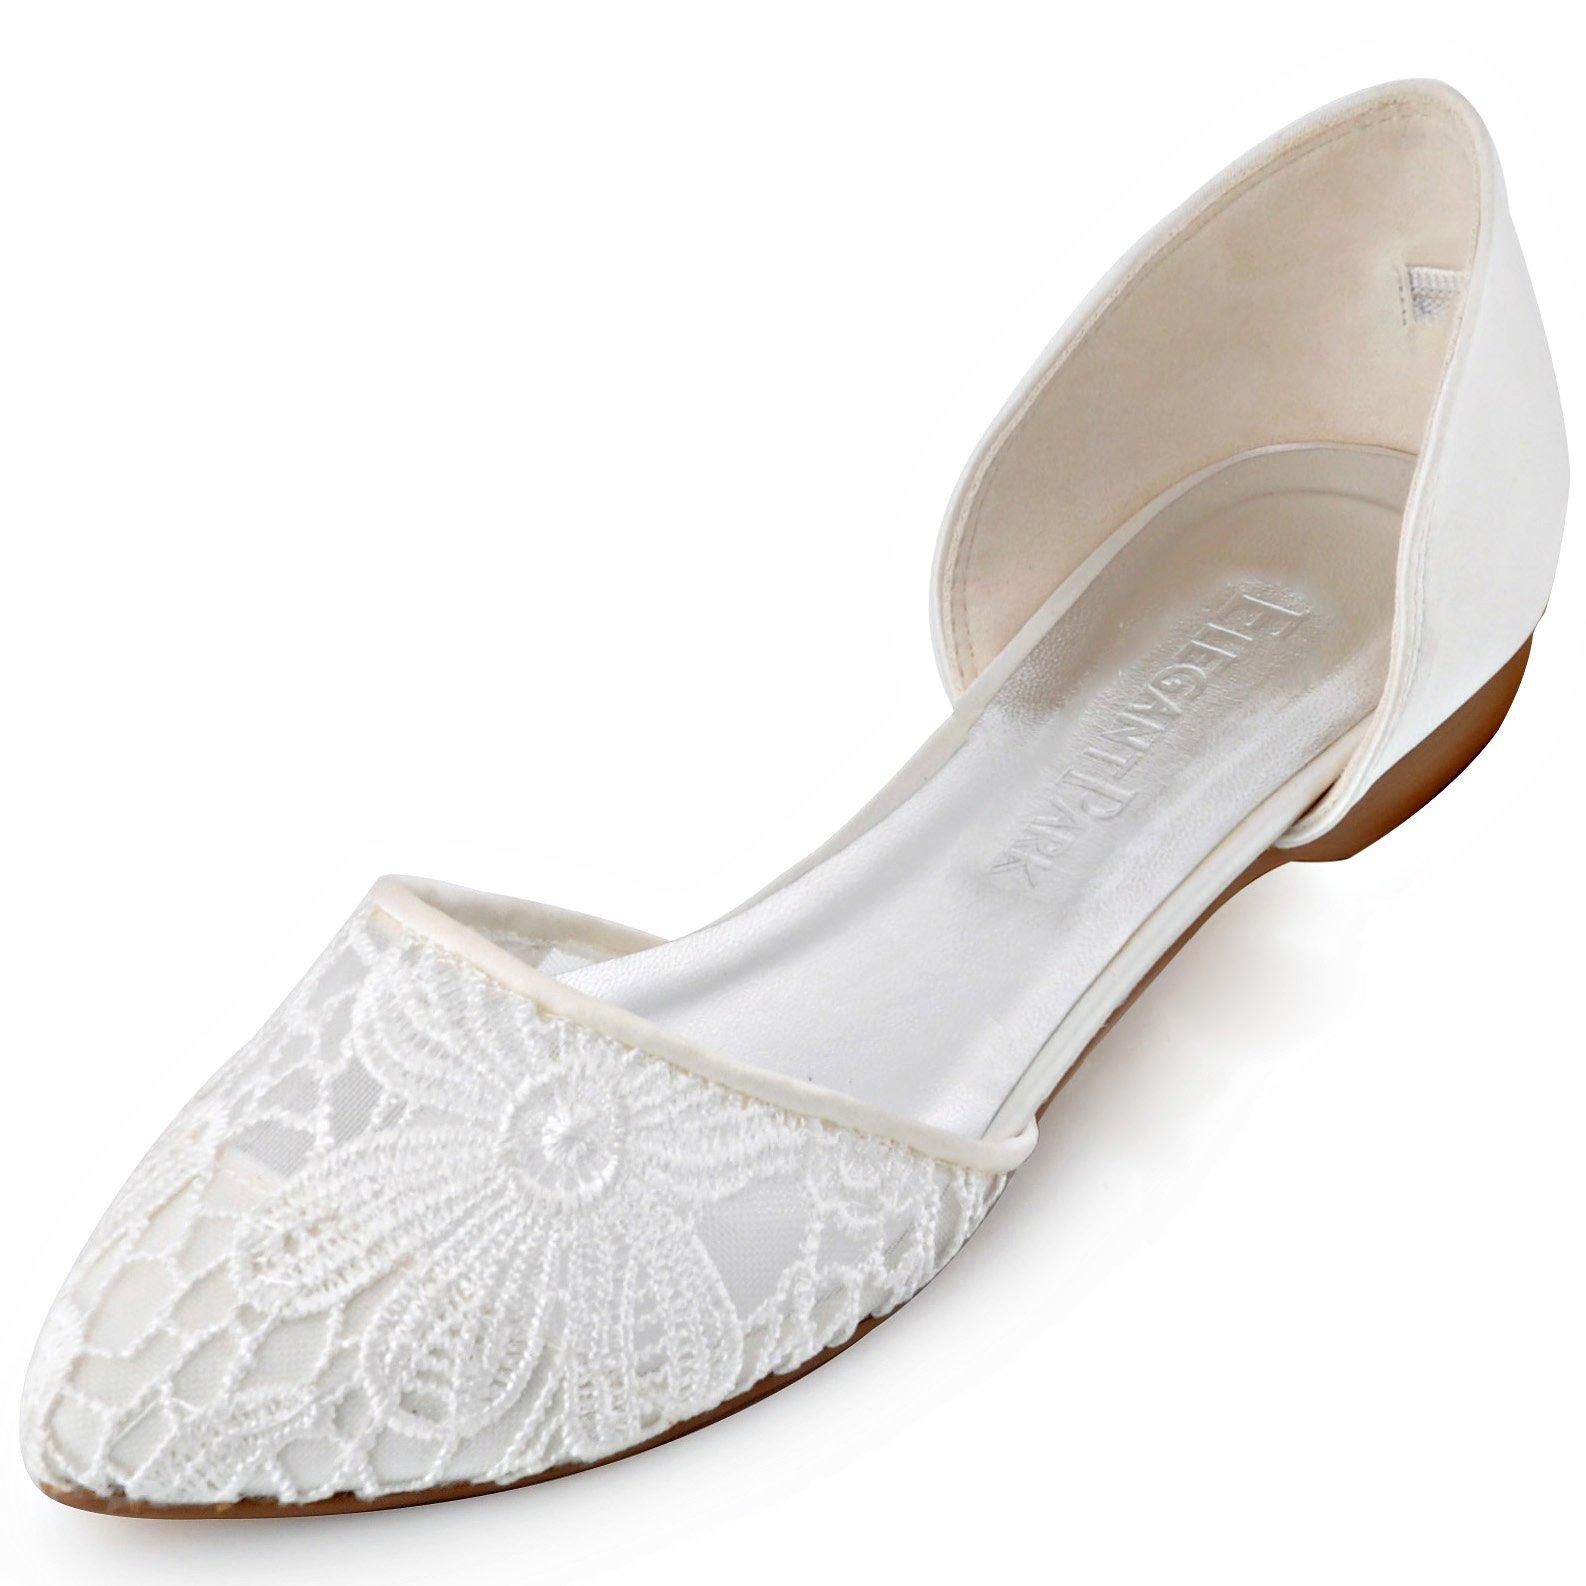 ElegantPark FC1527 Women Comfort Heel Pointed Toe Lace Bridal Wedding Flats Ivory US 11